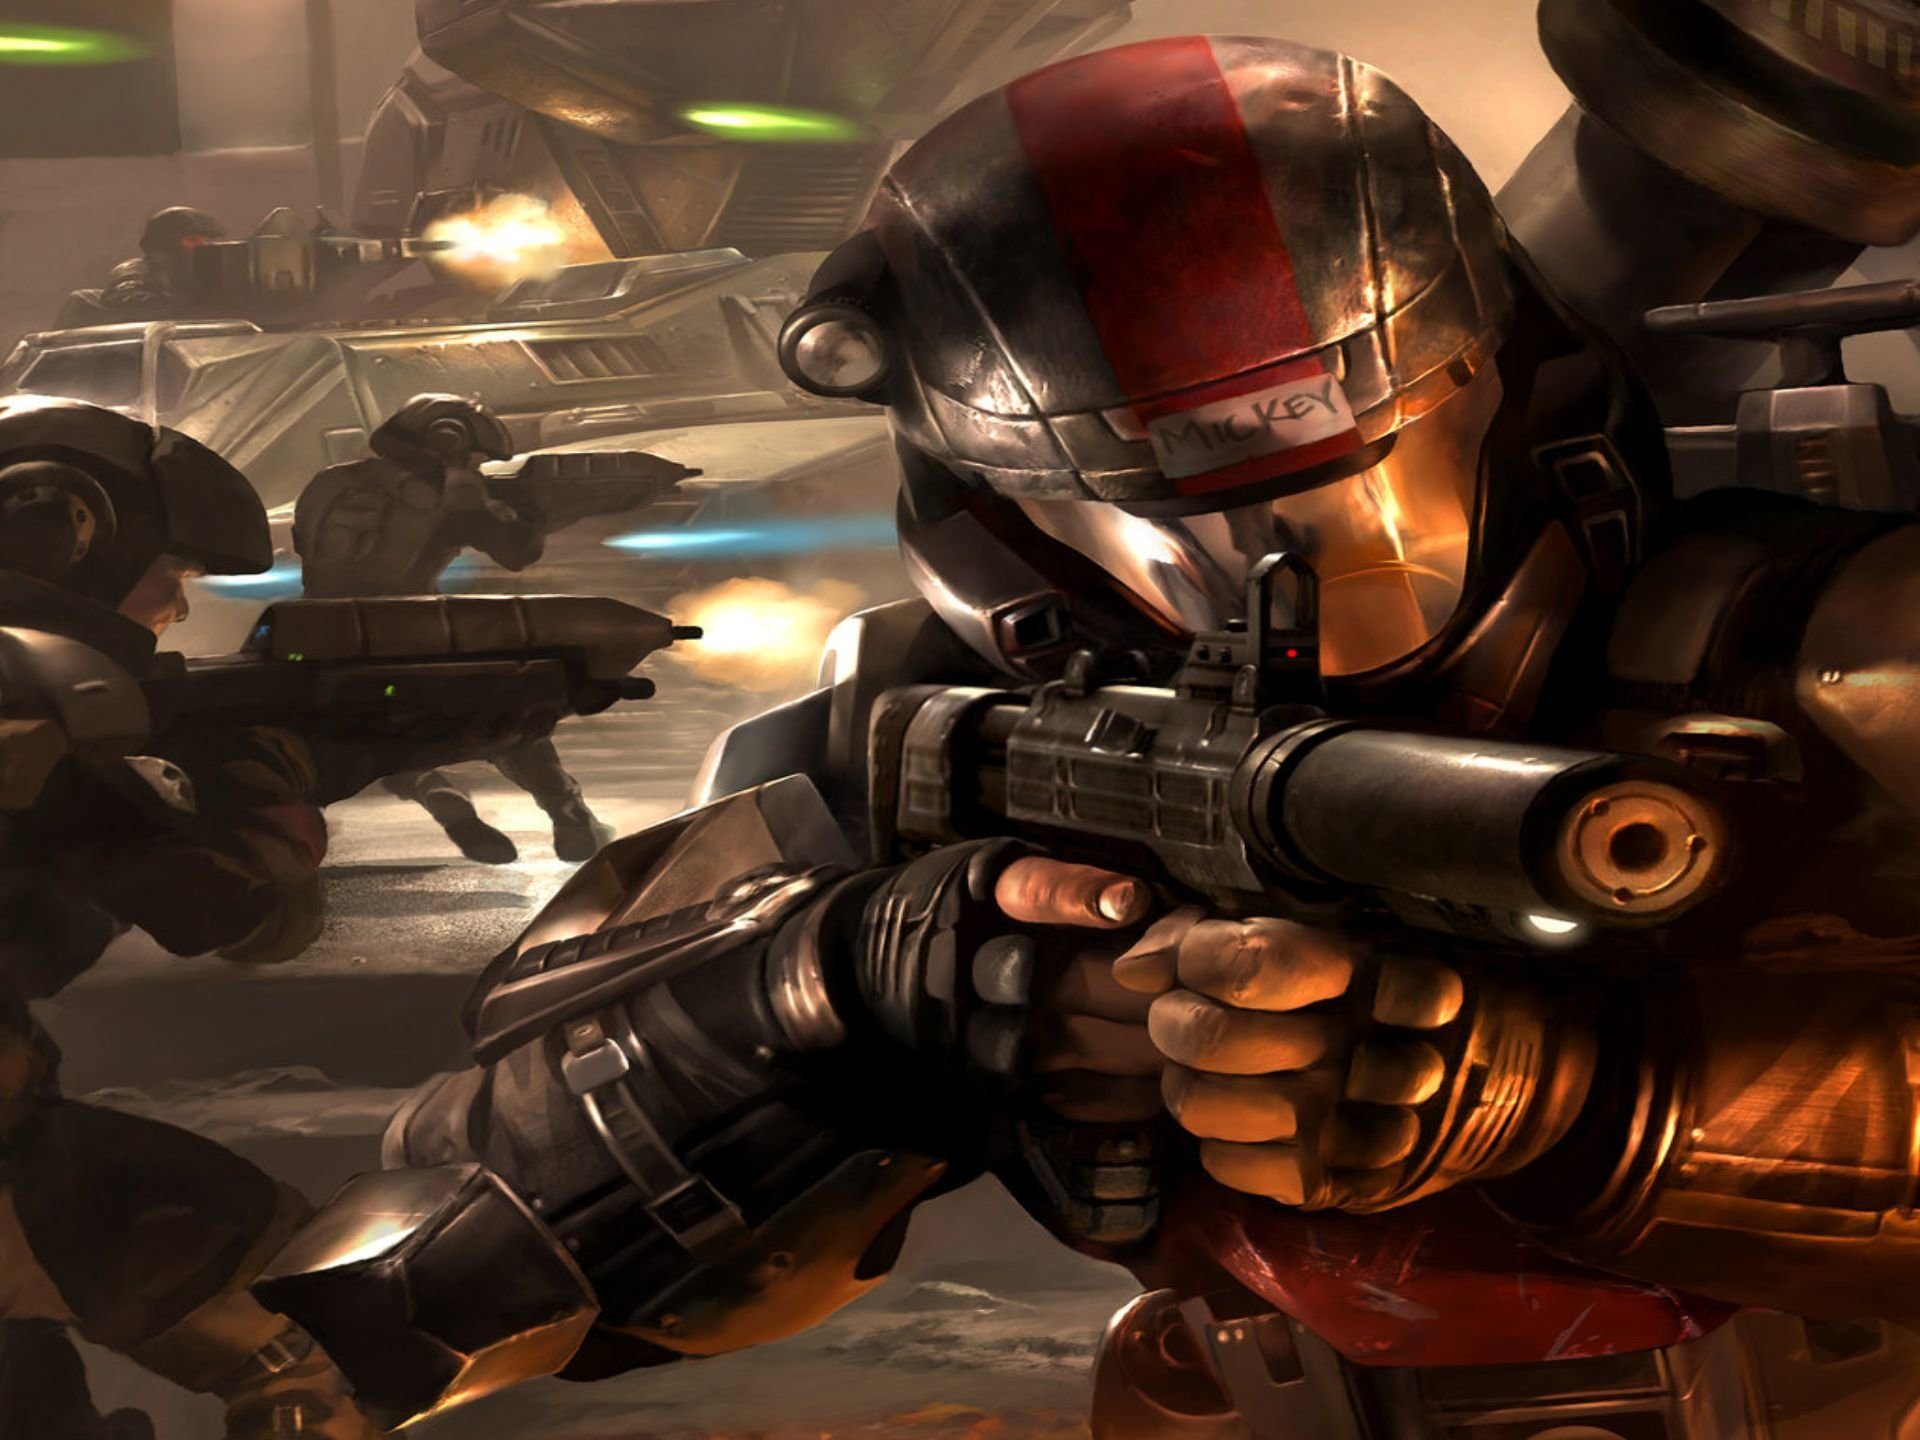 Halo 3 Odst Wallpapers Hd For Desktop Backgrounds